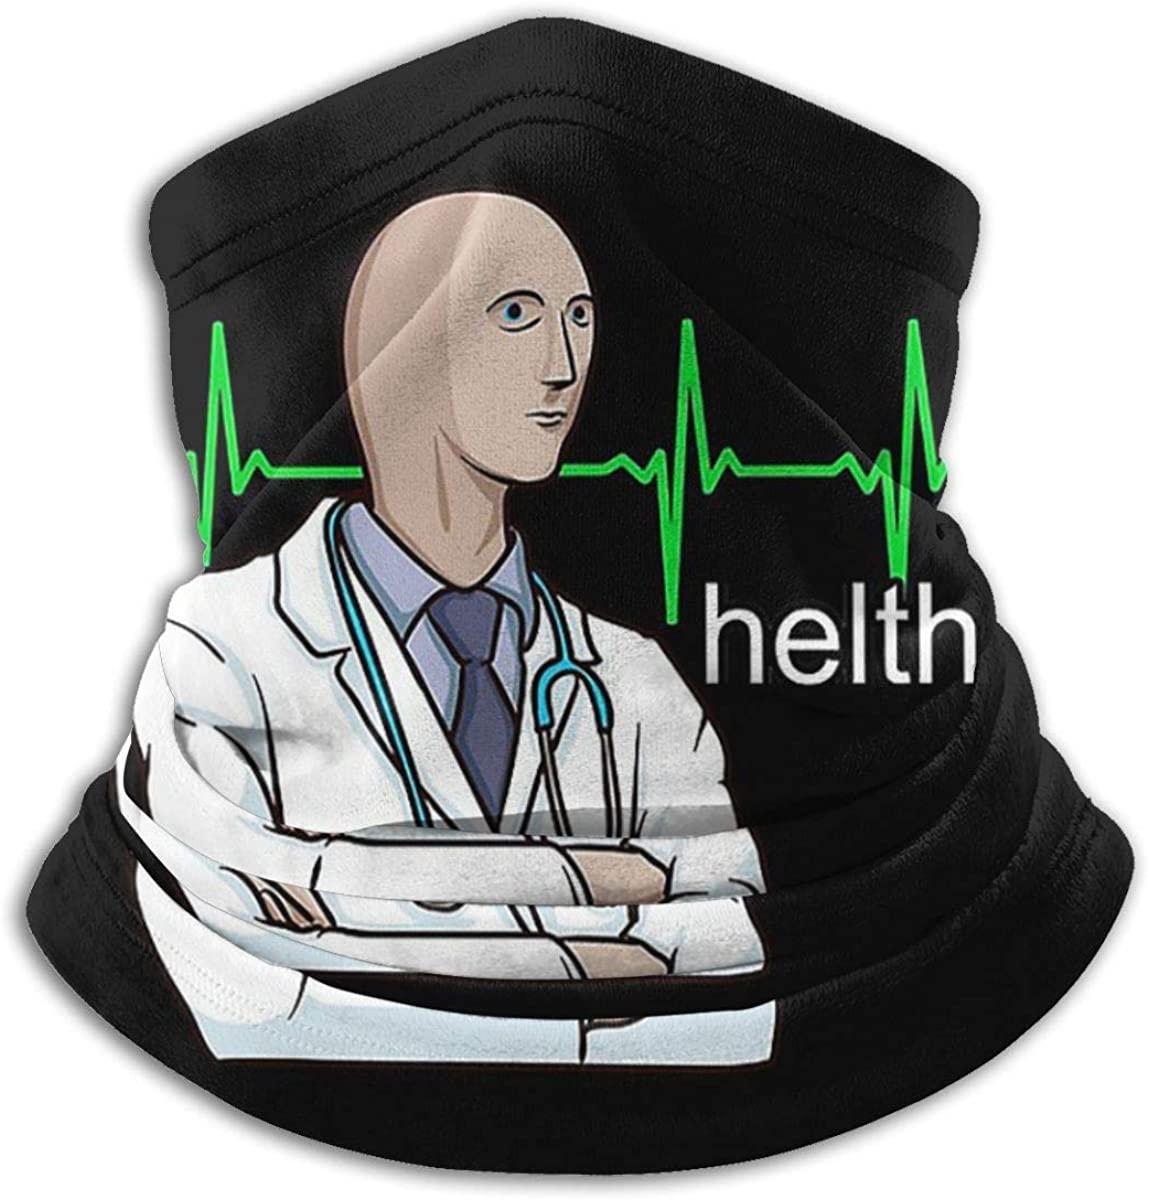 Helth Meme Bandana Face Mask Balaclava Unisex Seamless Face Cover Mask Headband Headwear